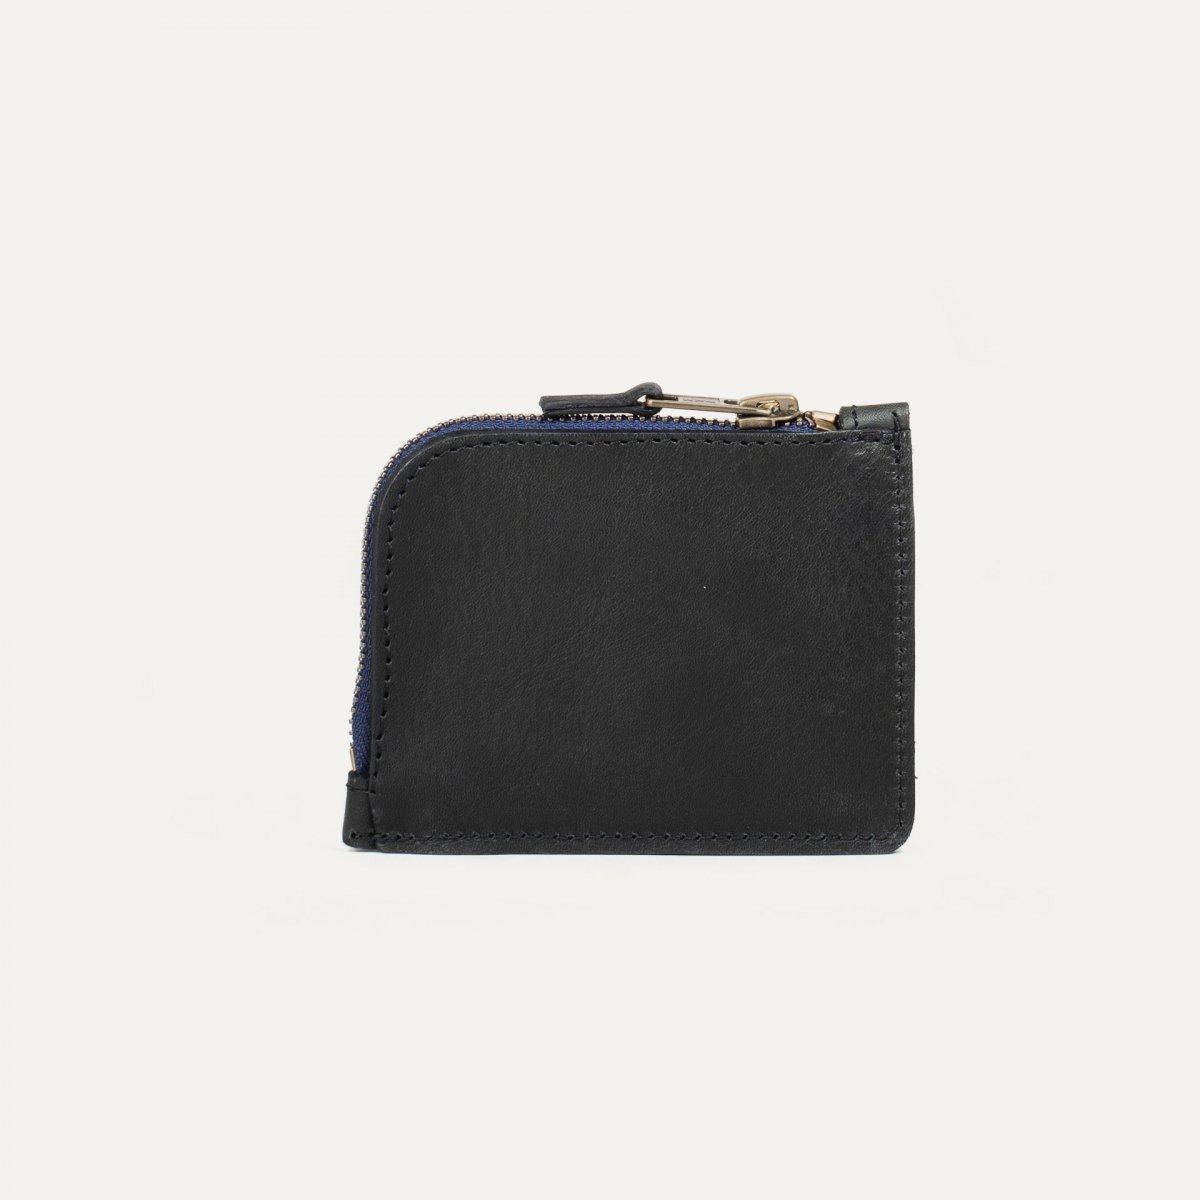 Porte monnaie zippé As / M - Noir (image n°2)